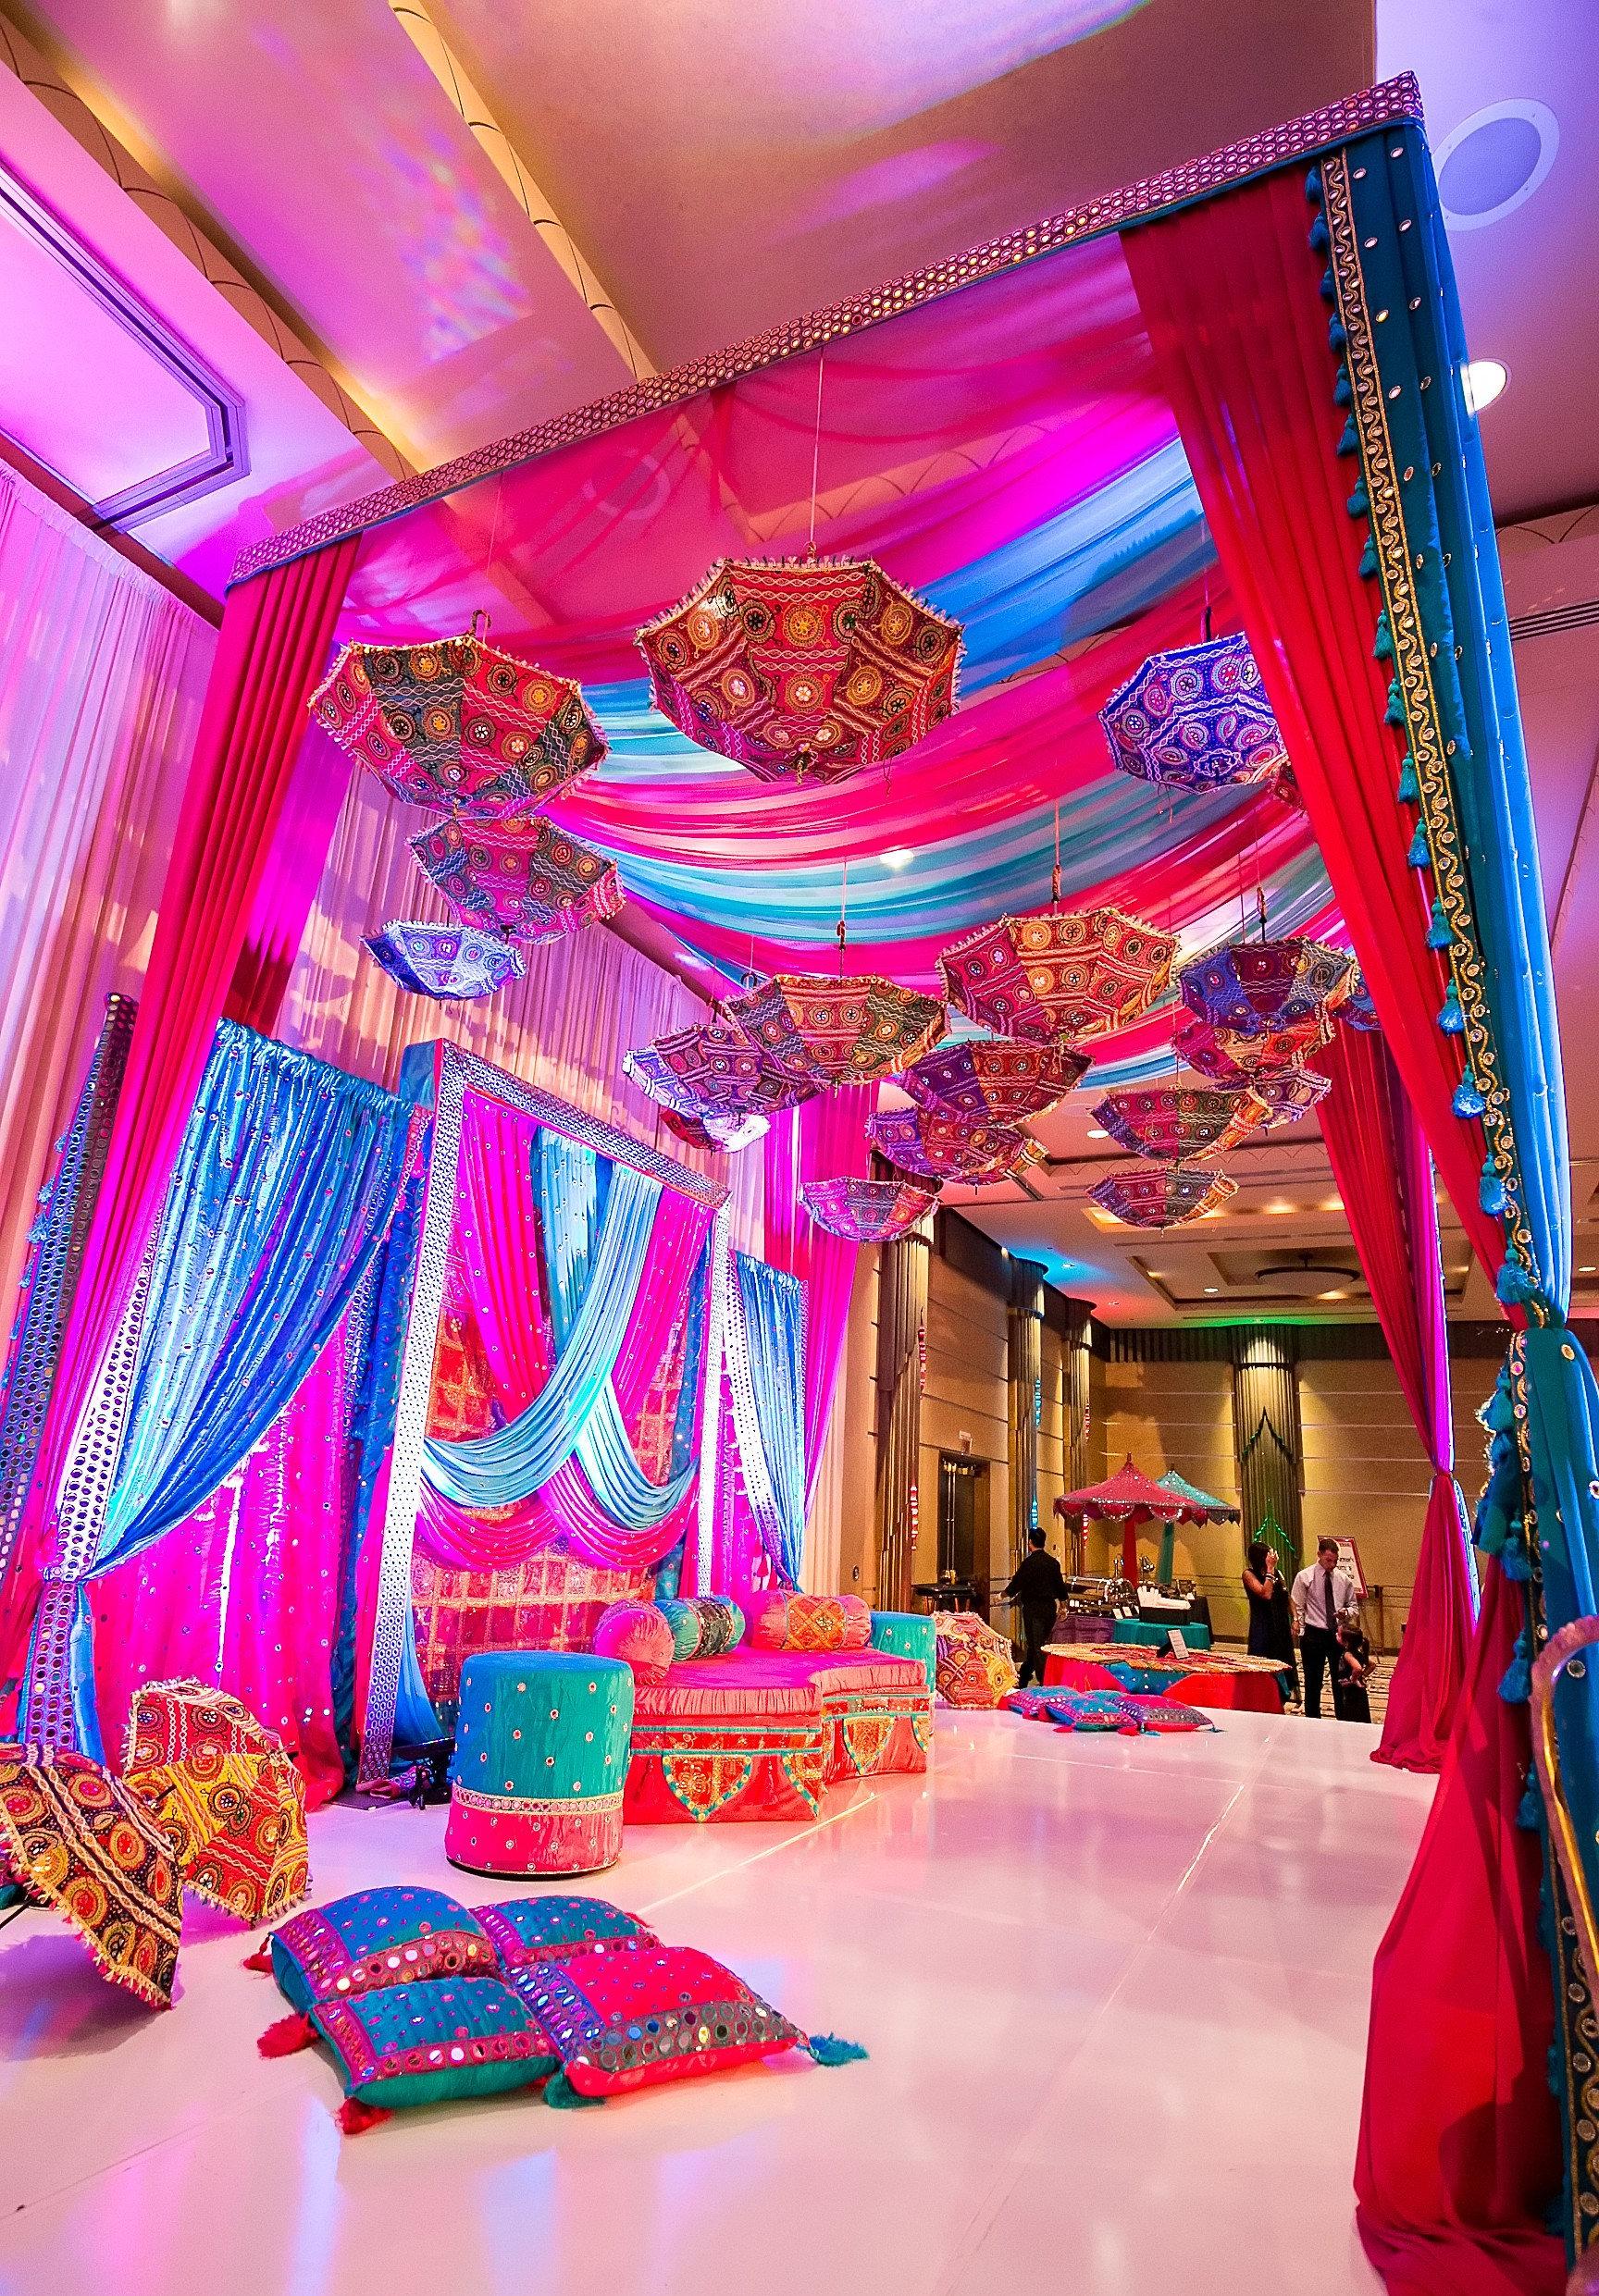 15 Pcs Decoration umbrella wedding umbrella henna mehndi night decor parasol mirror work umbrella gift for her umbrella handcrafted umbrella